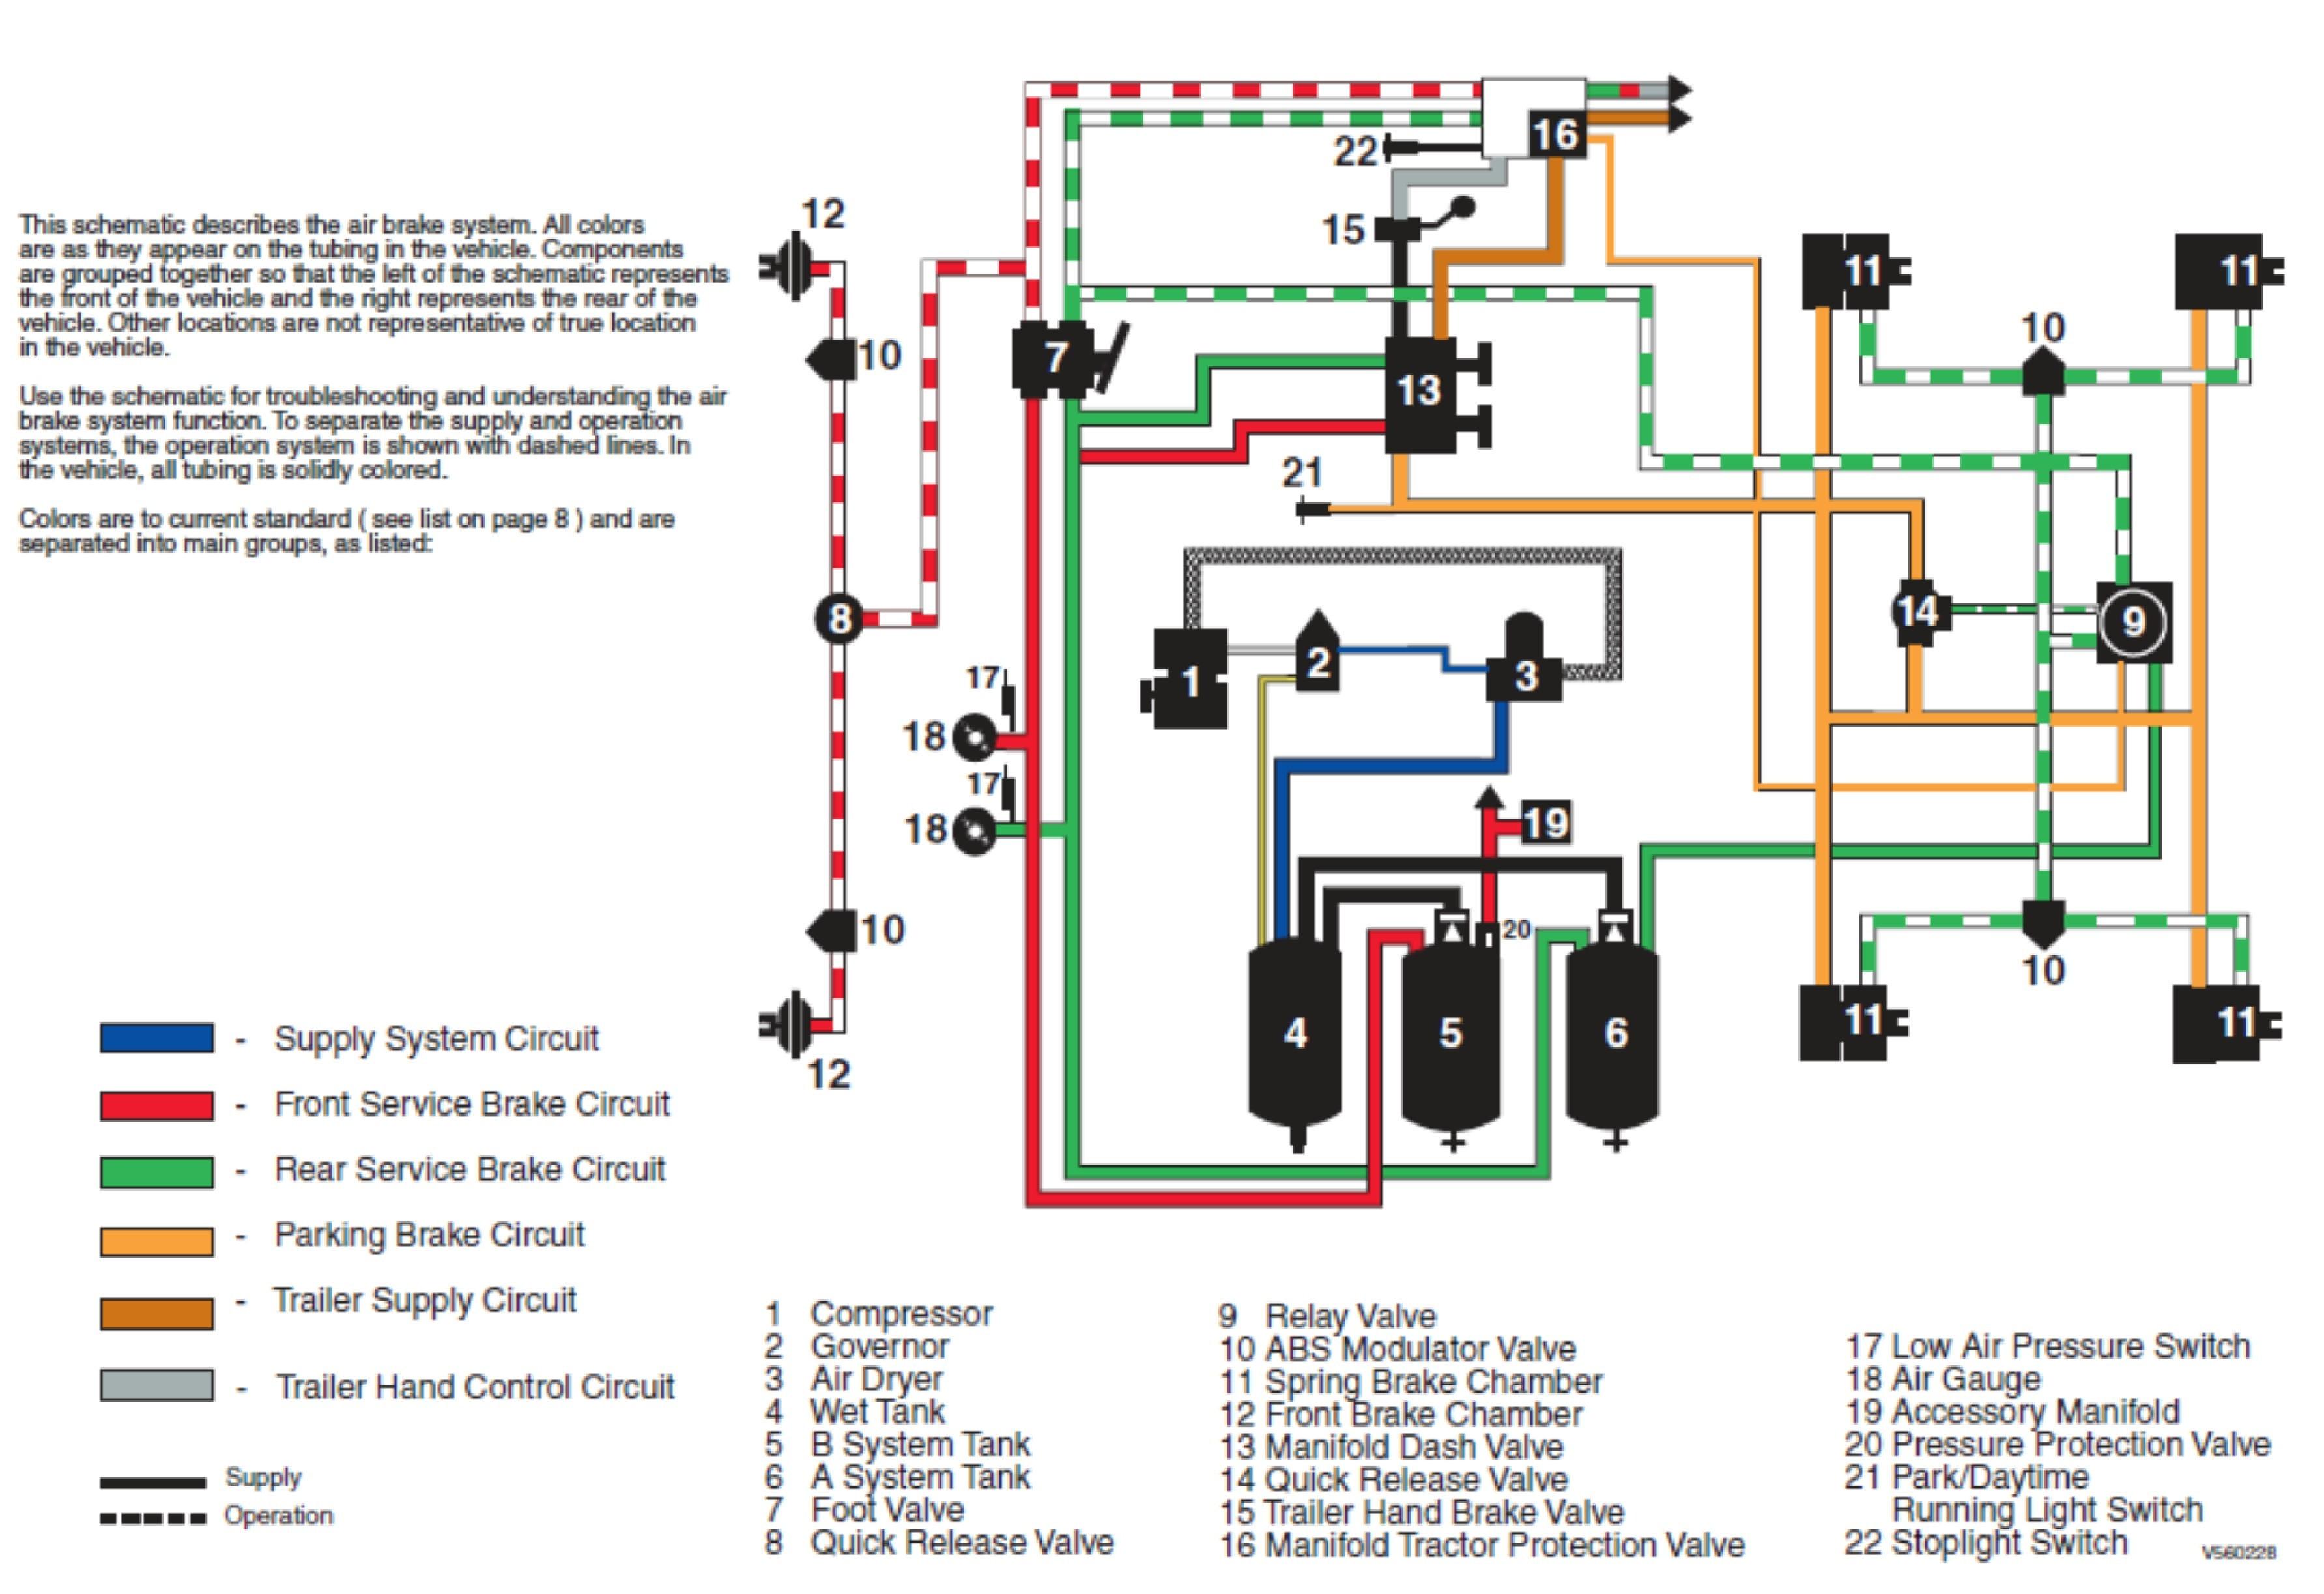 Freightliner Air System Diagram Hayes Brakesmart Maxbrake Controllers Of Freightliner Air System Diagram